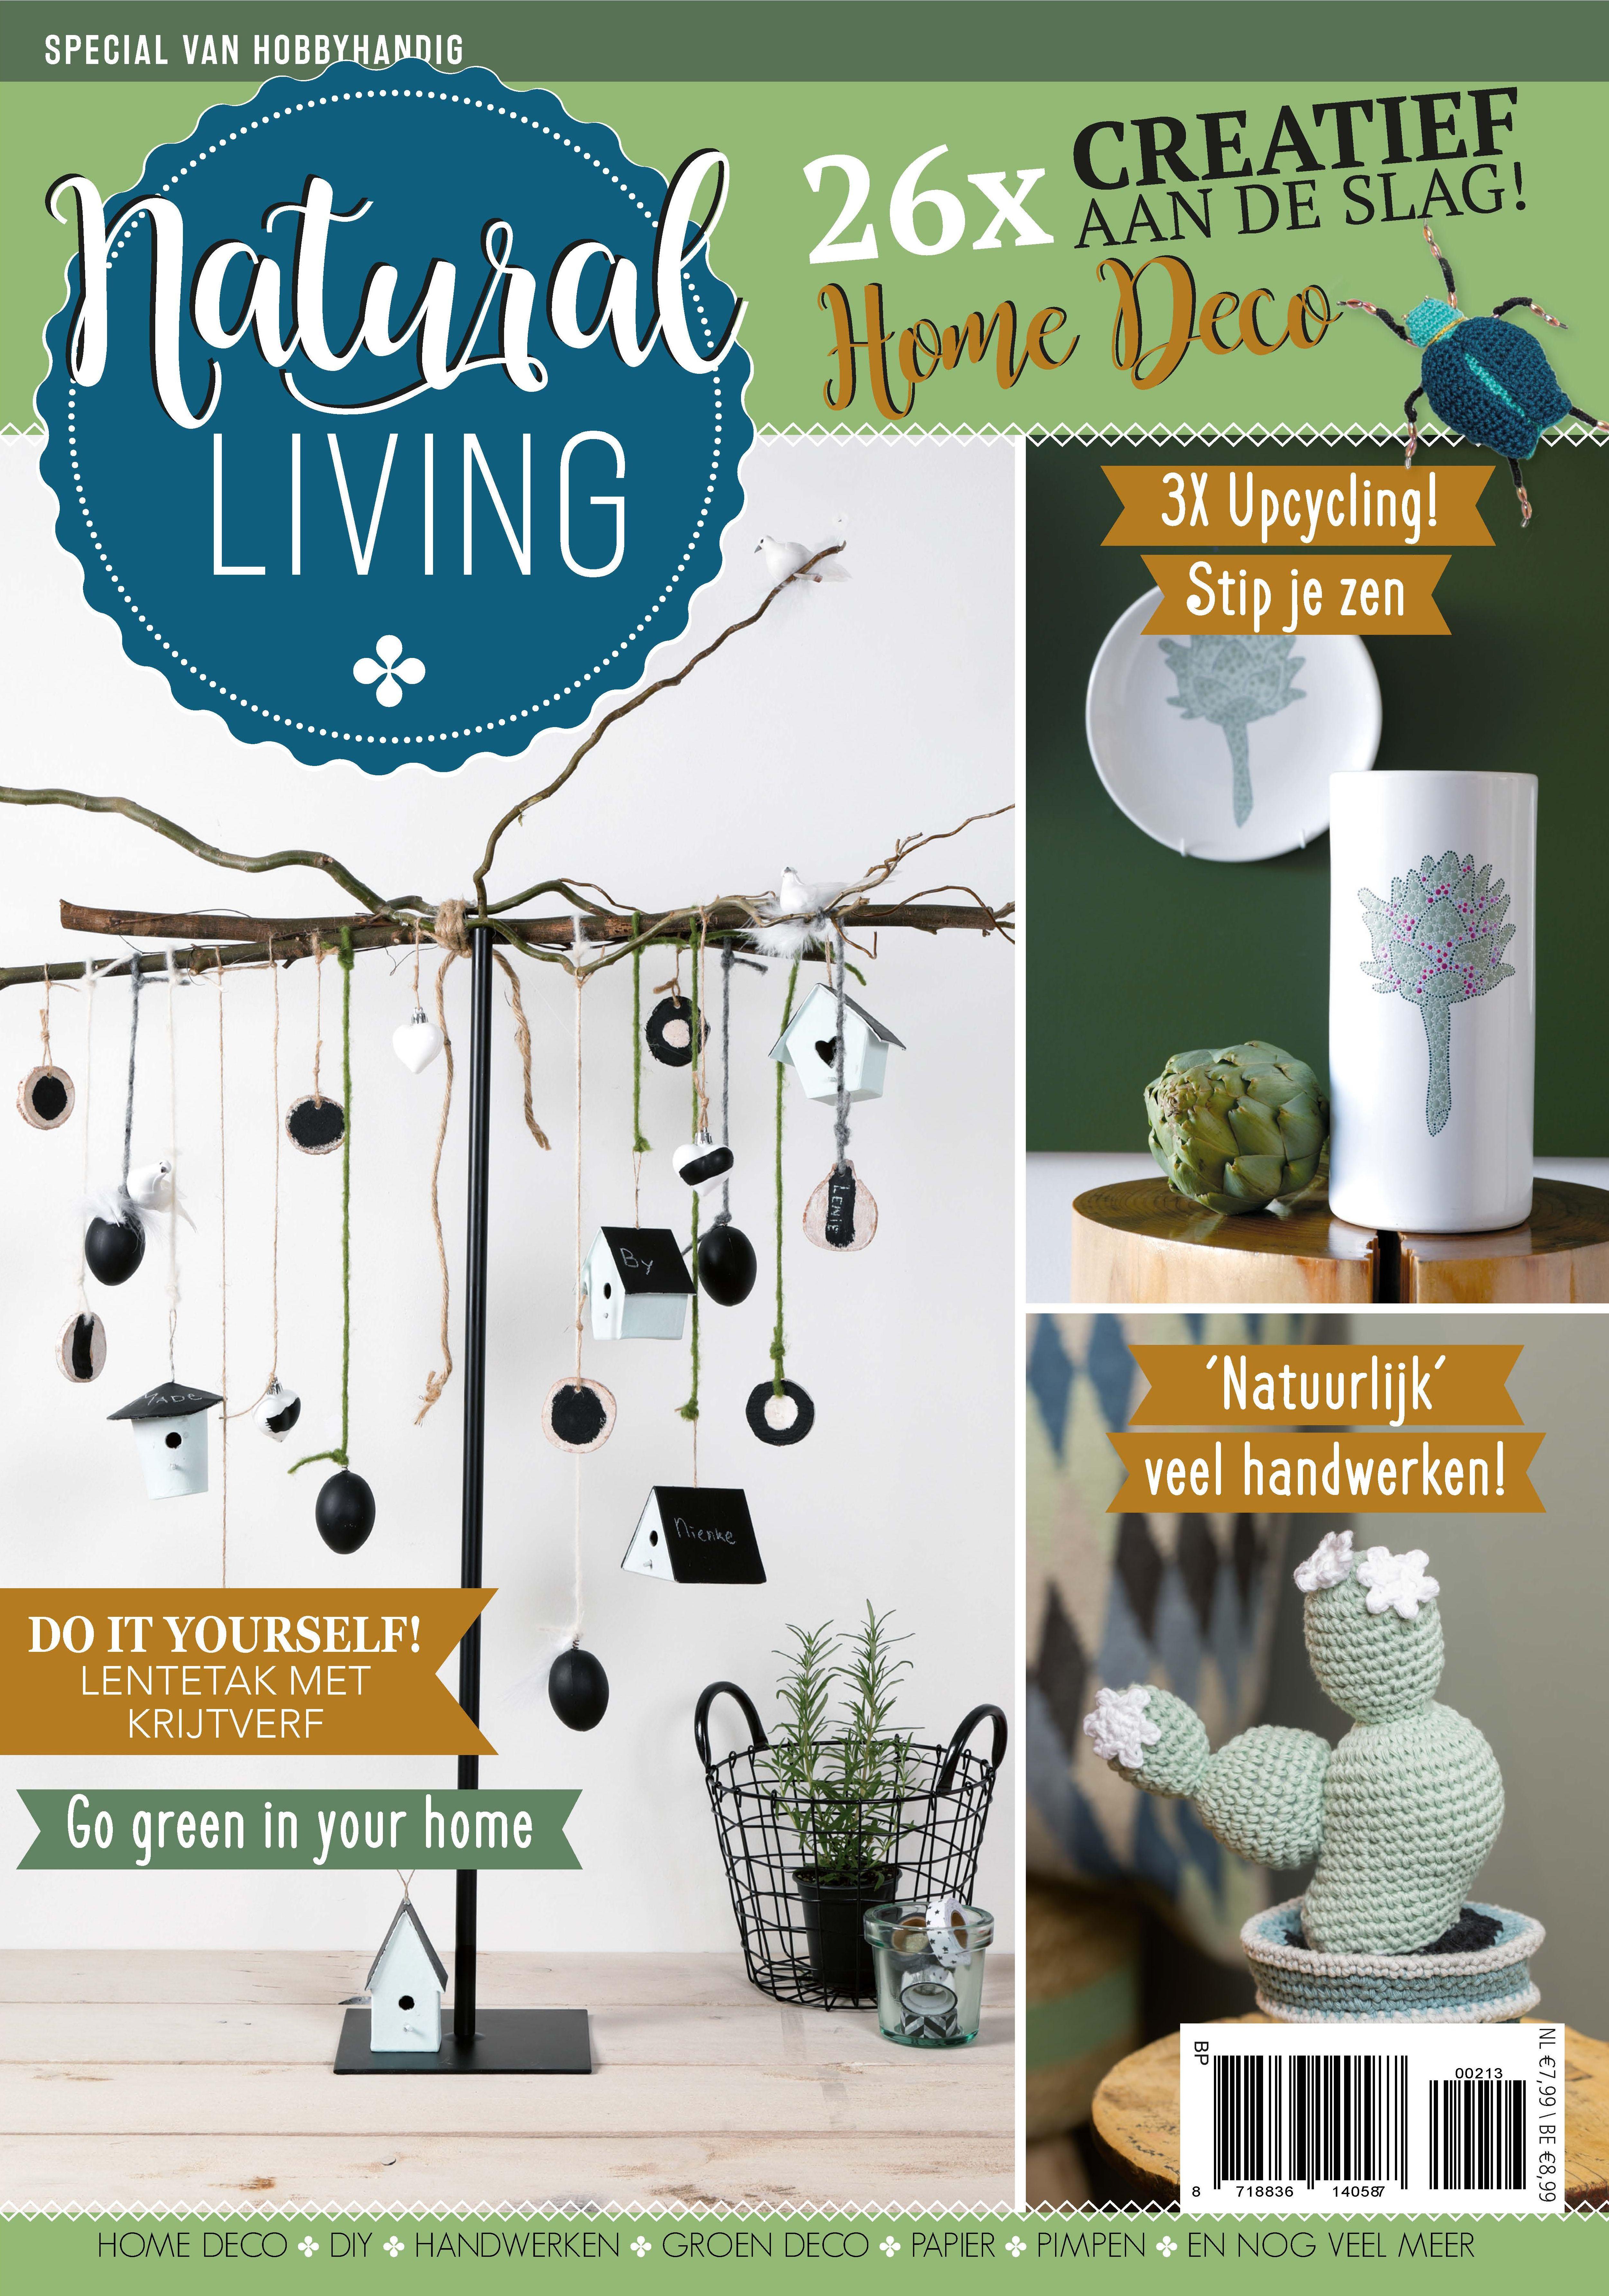 Hobbyhandig Natural Living special